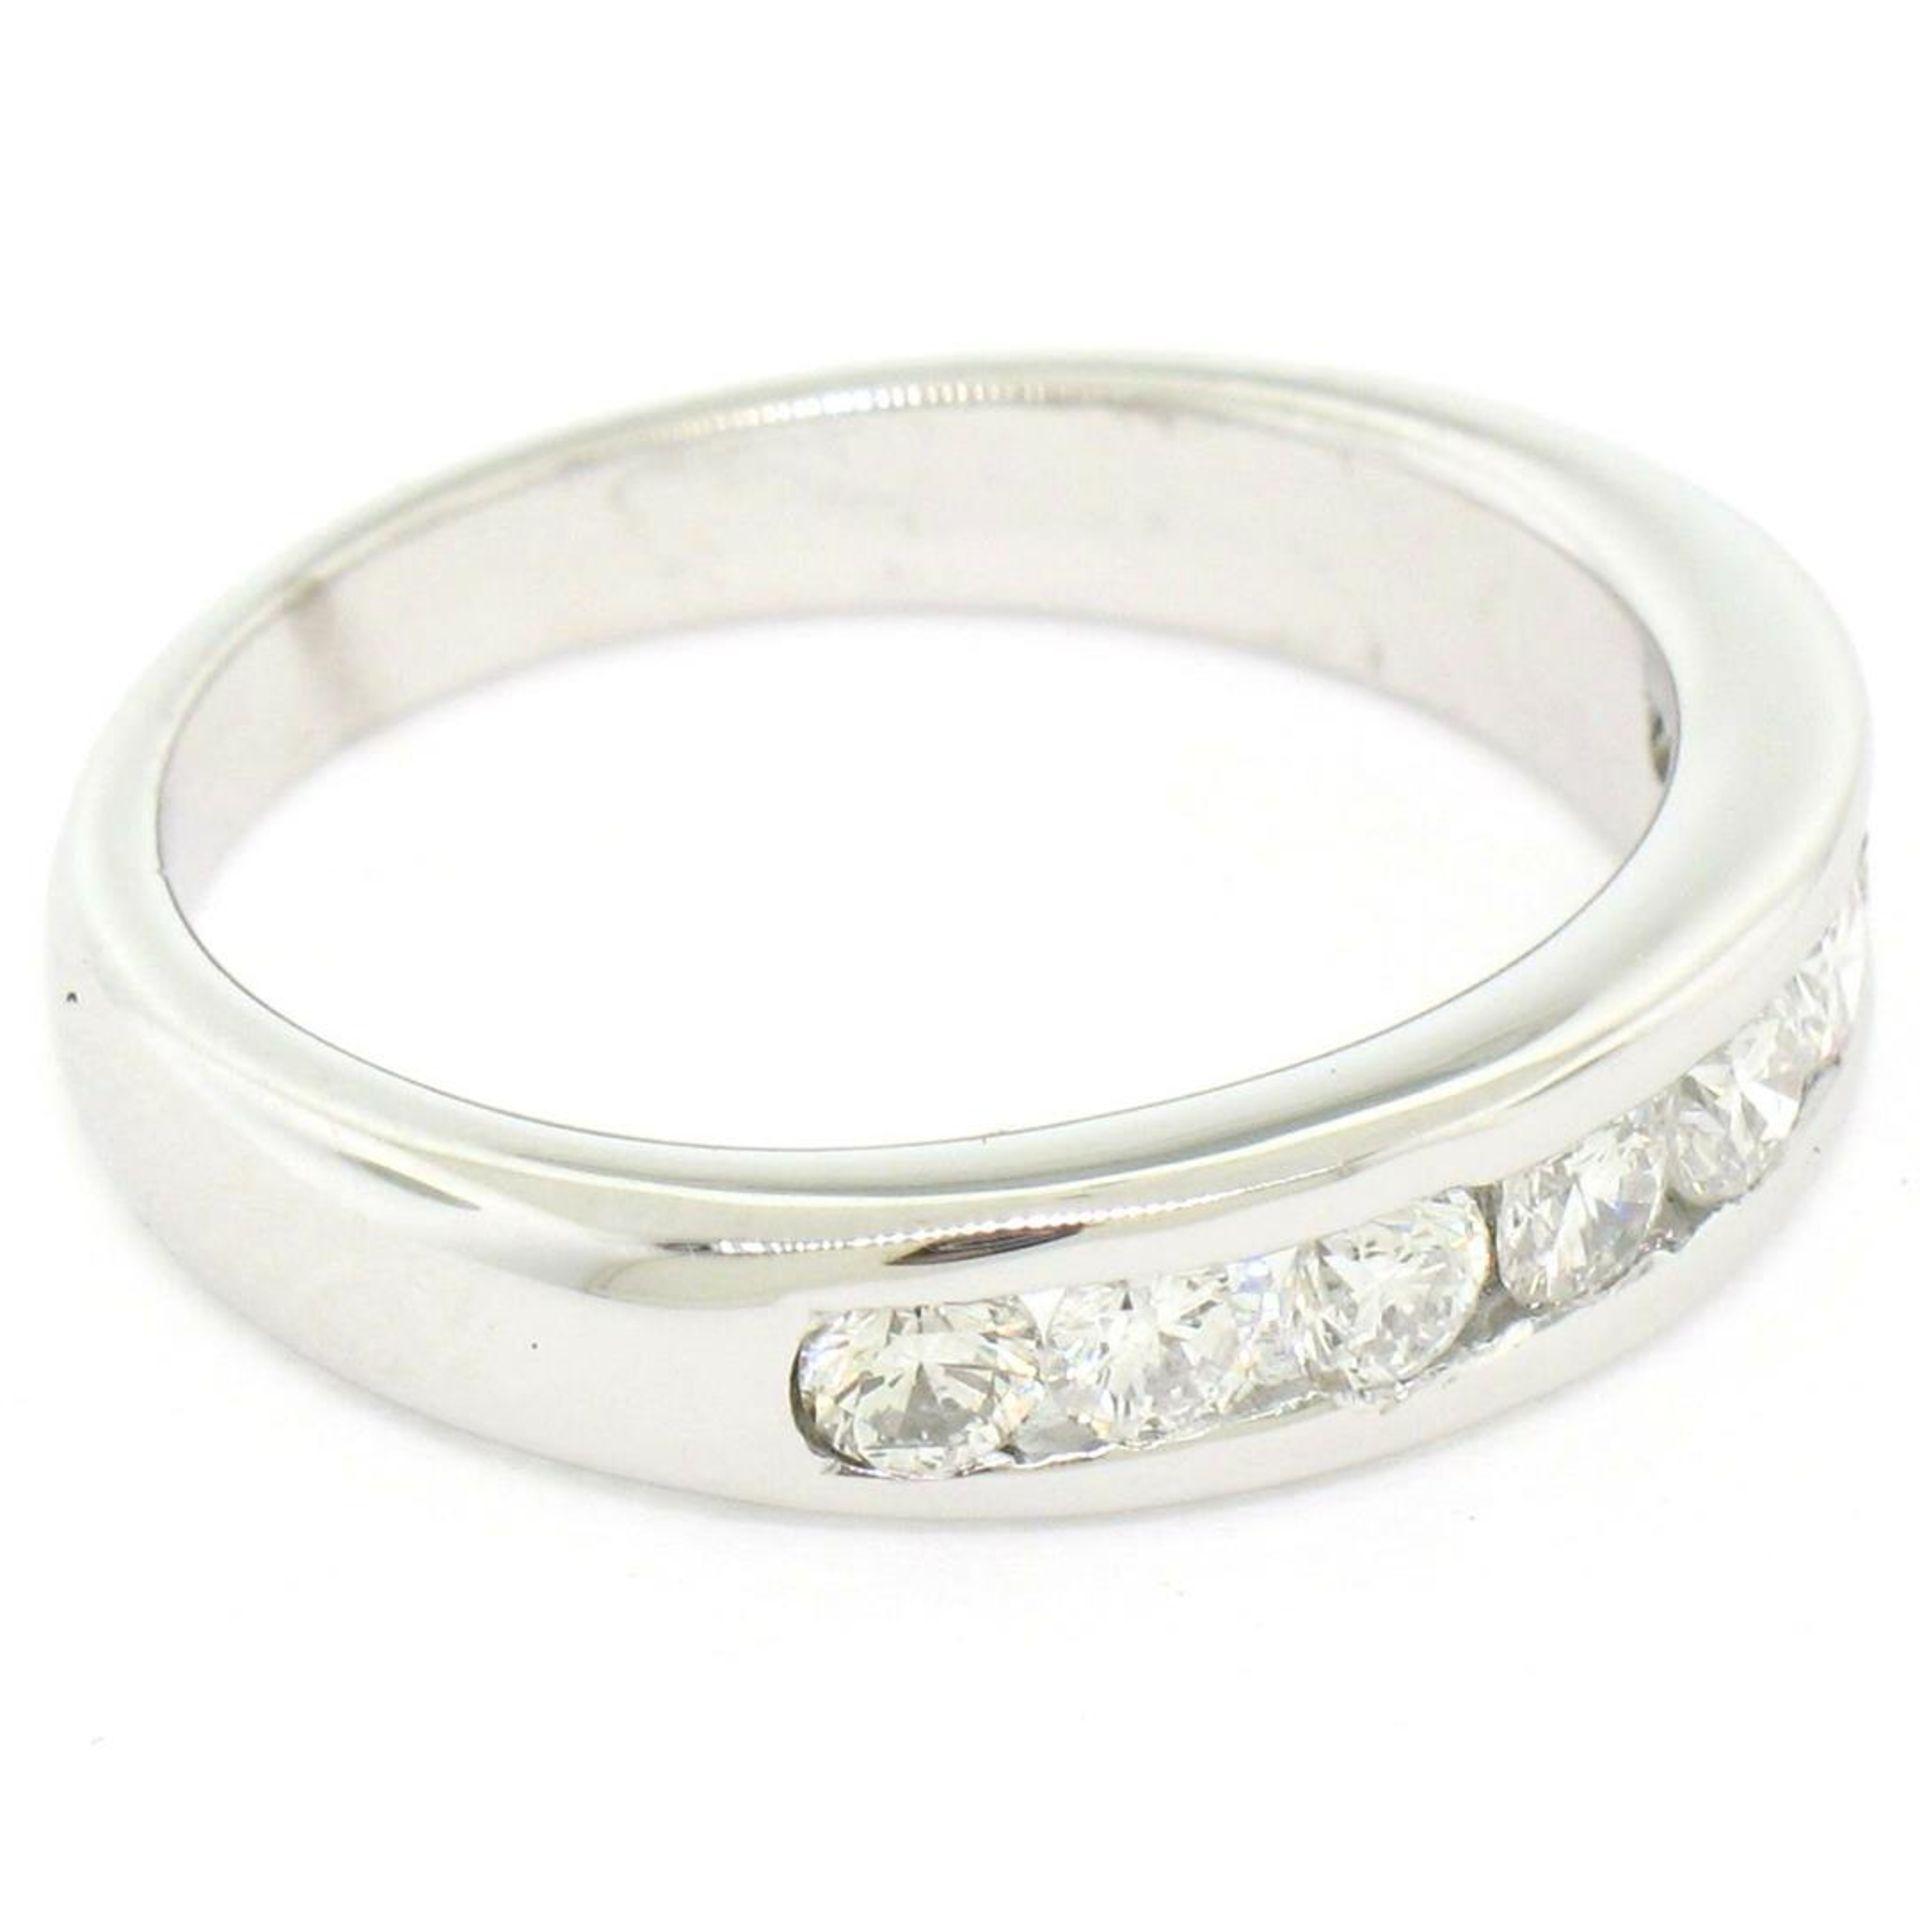 Classic Platinum .80ctw Channel Set Round Brilliant VS Diamond Wedding Band Ring - Image 6 of 8